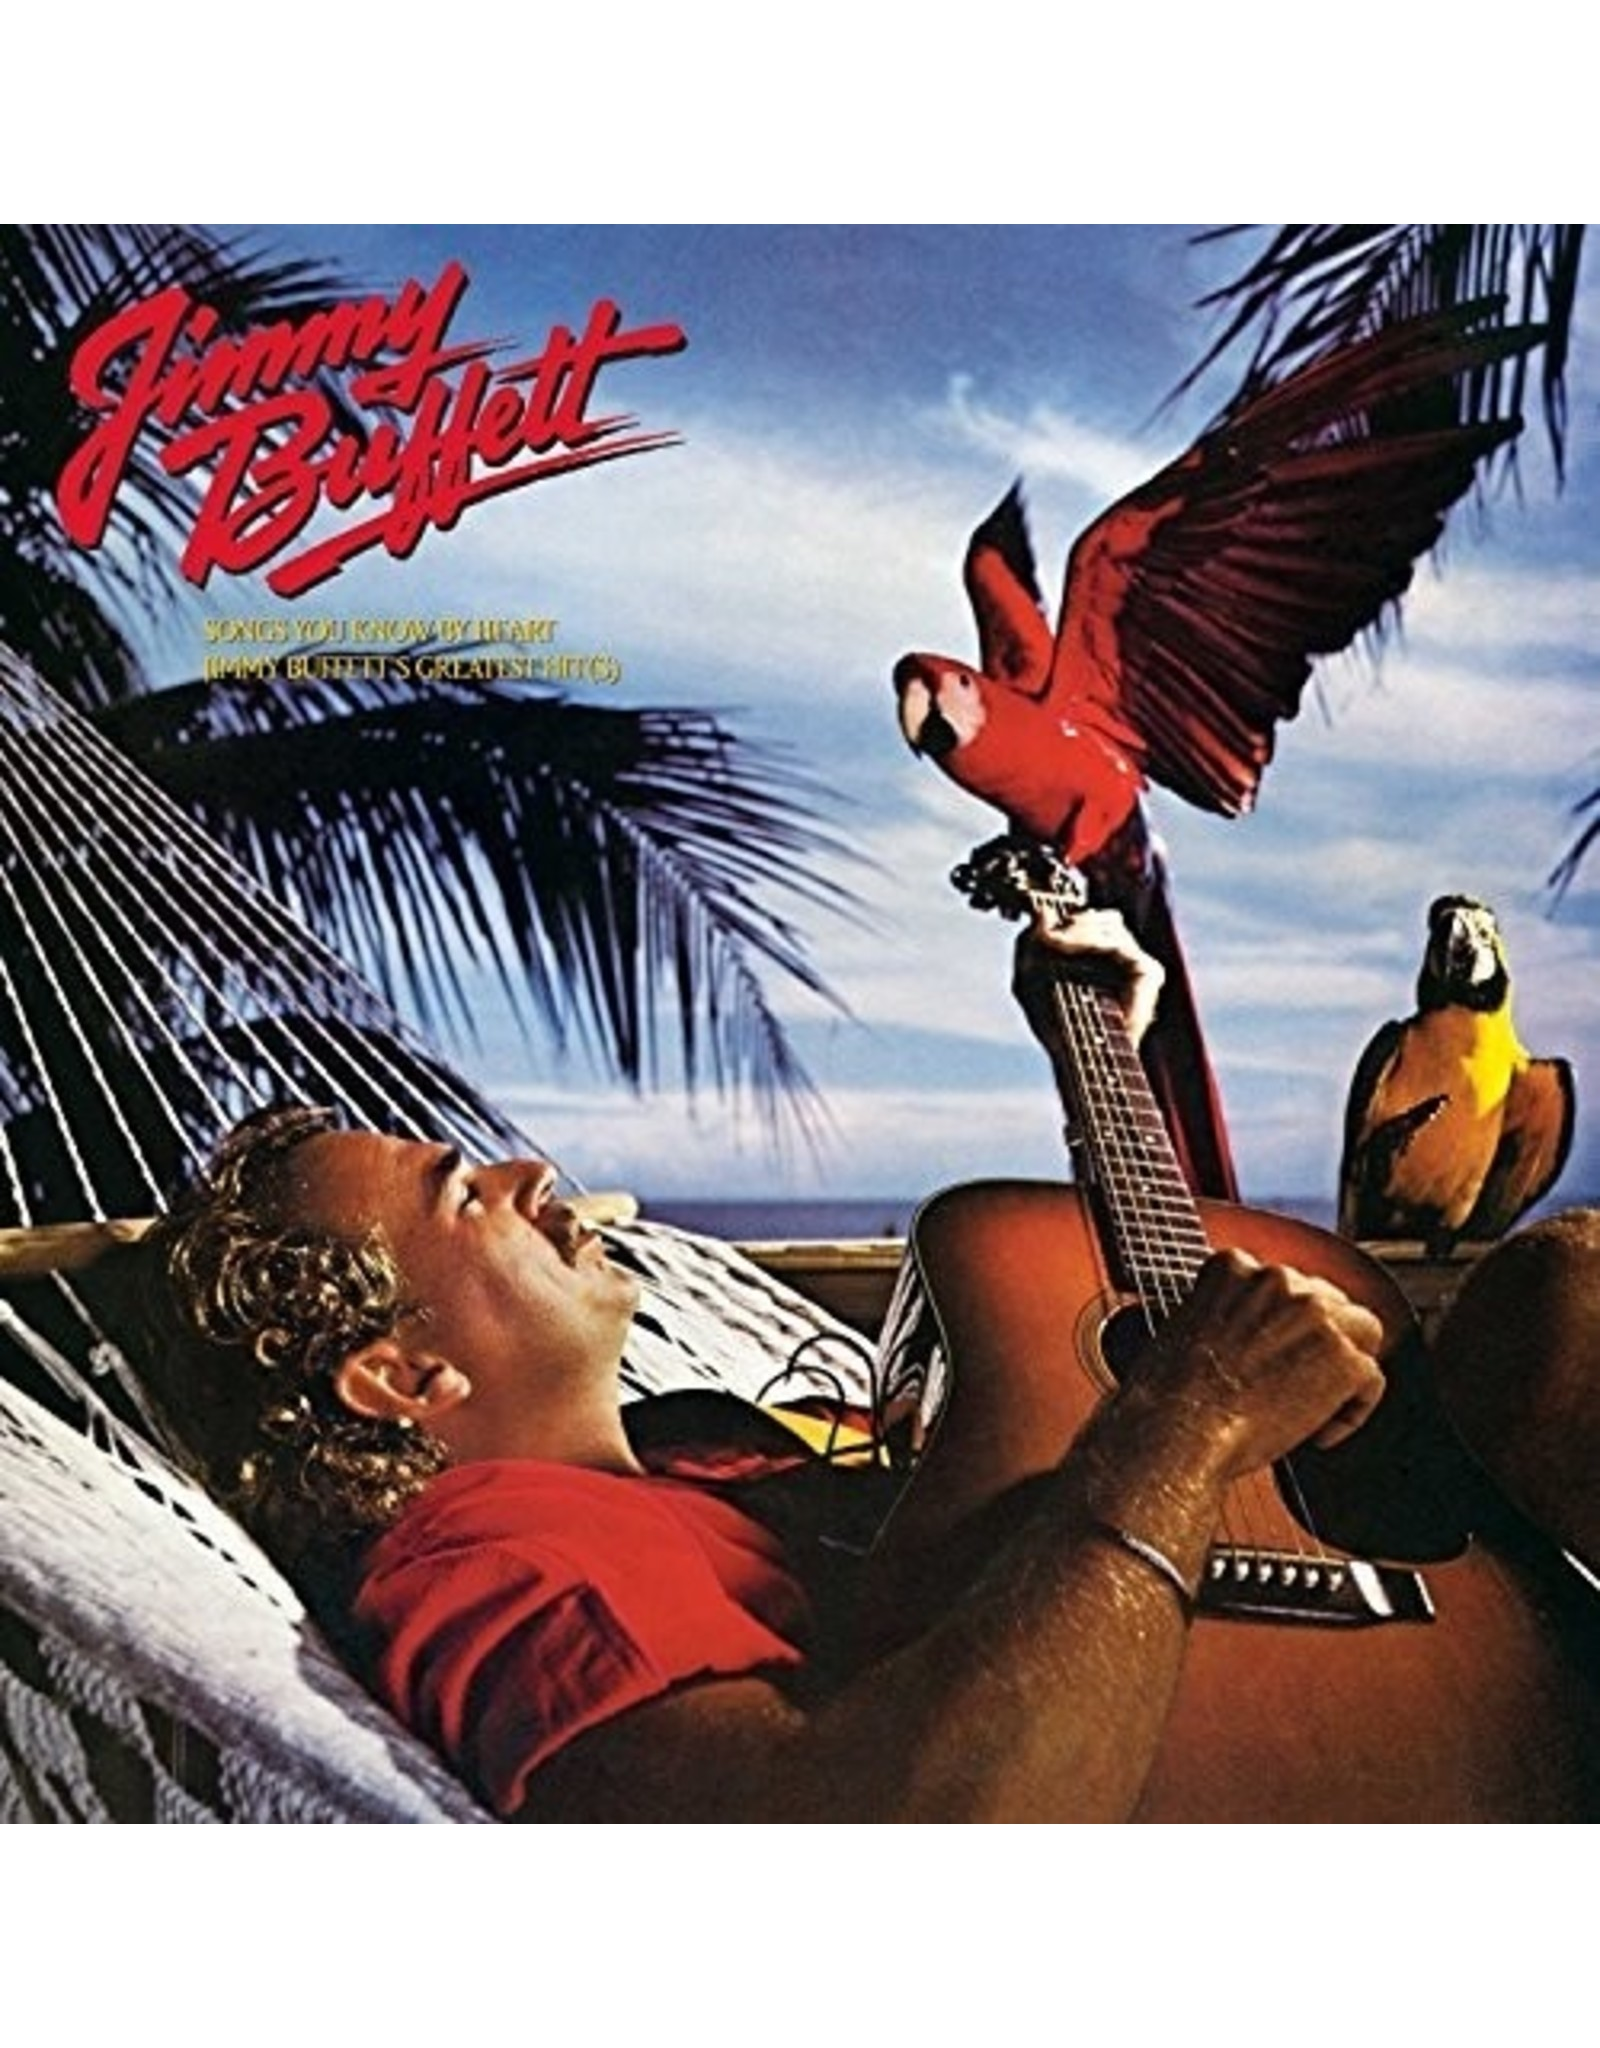 New Vinyl Jimmy Buffett - Songs You Know By Heart: Greatest Hit(s) LP